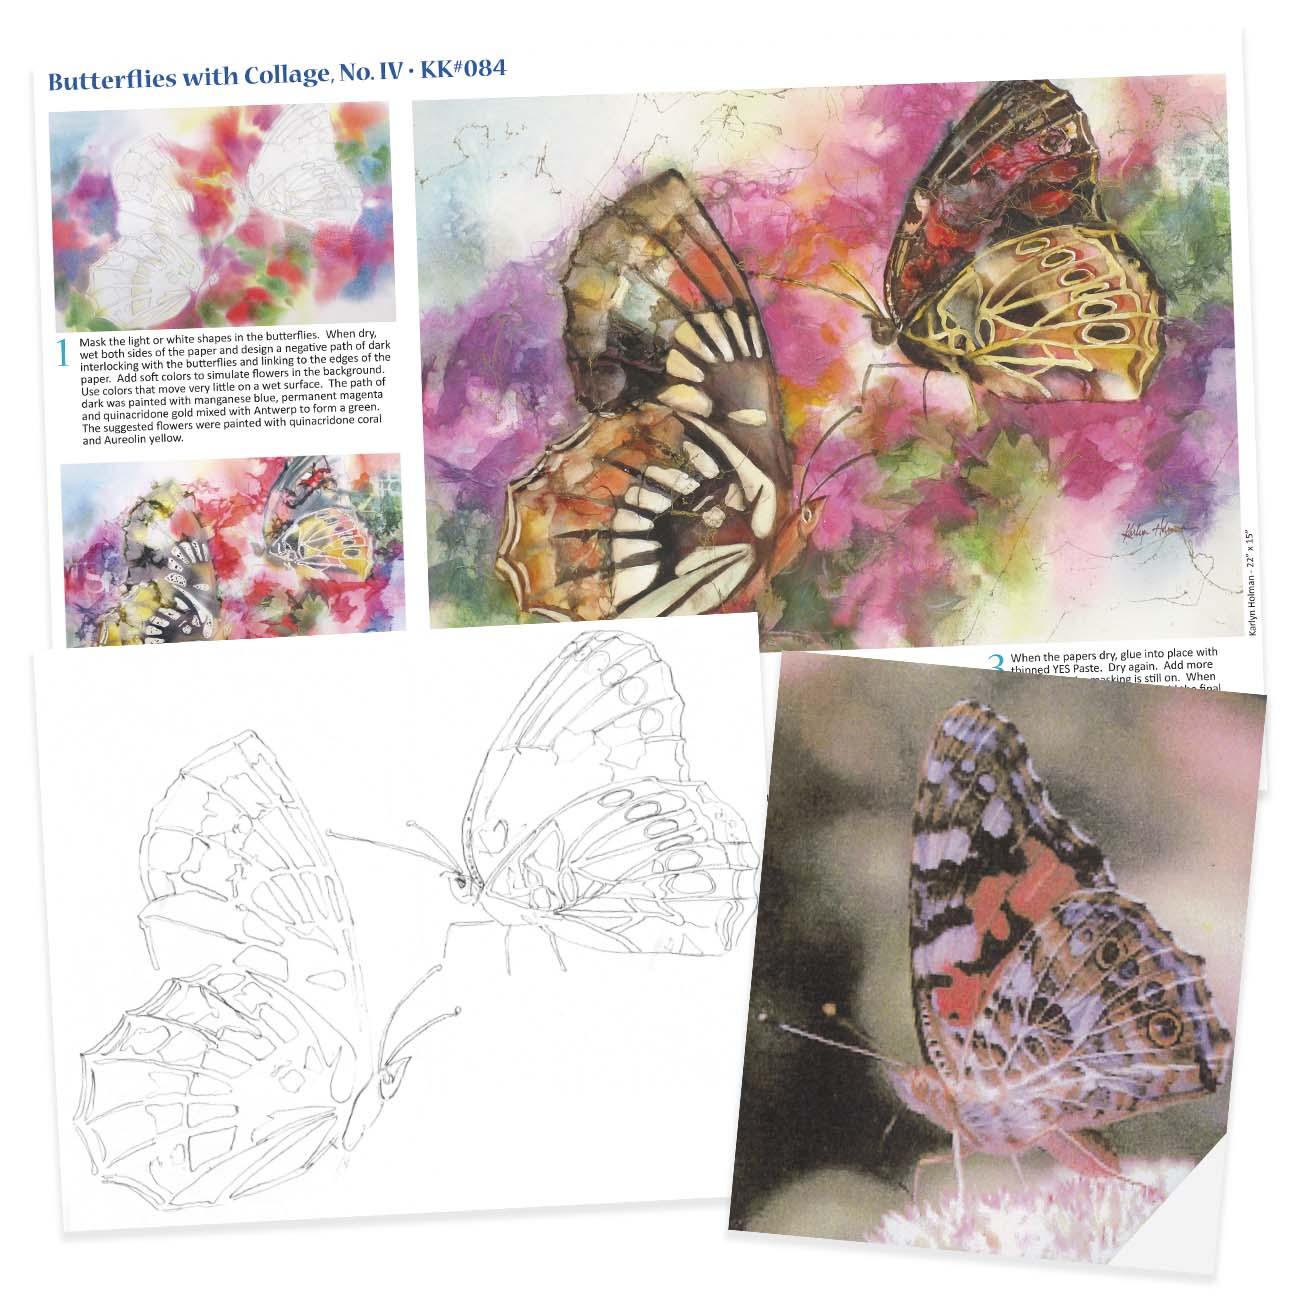 KK084 - Butterflies Collage No. IV